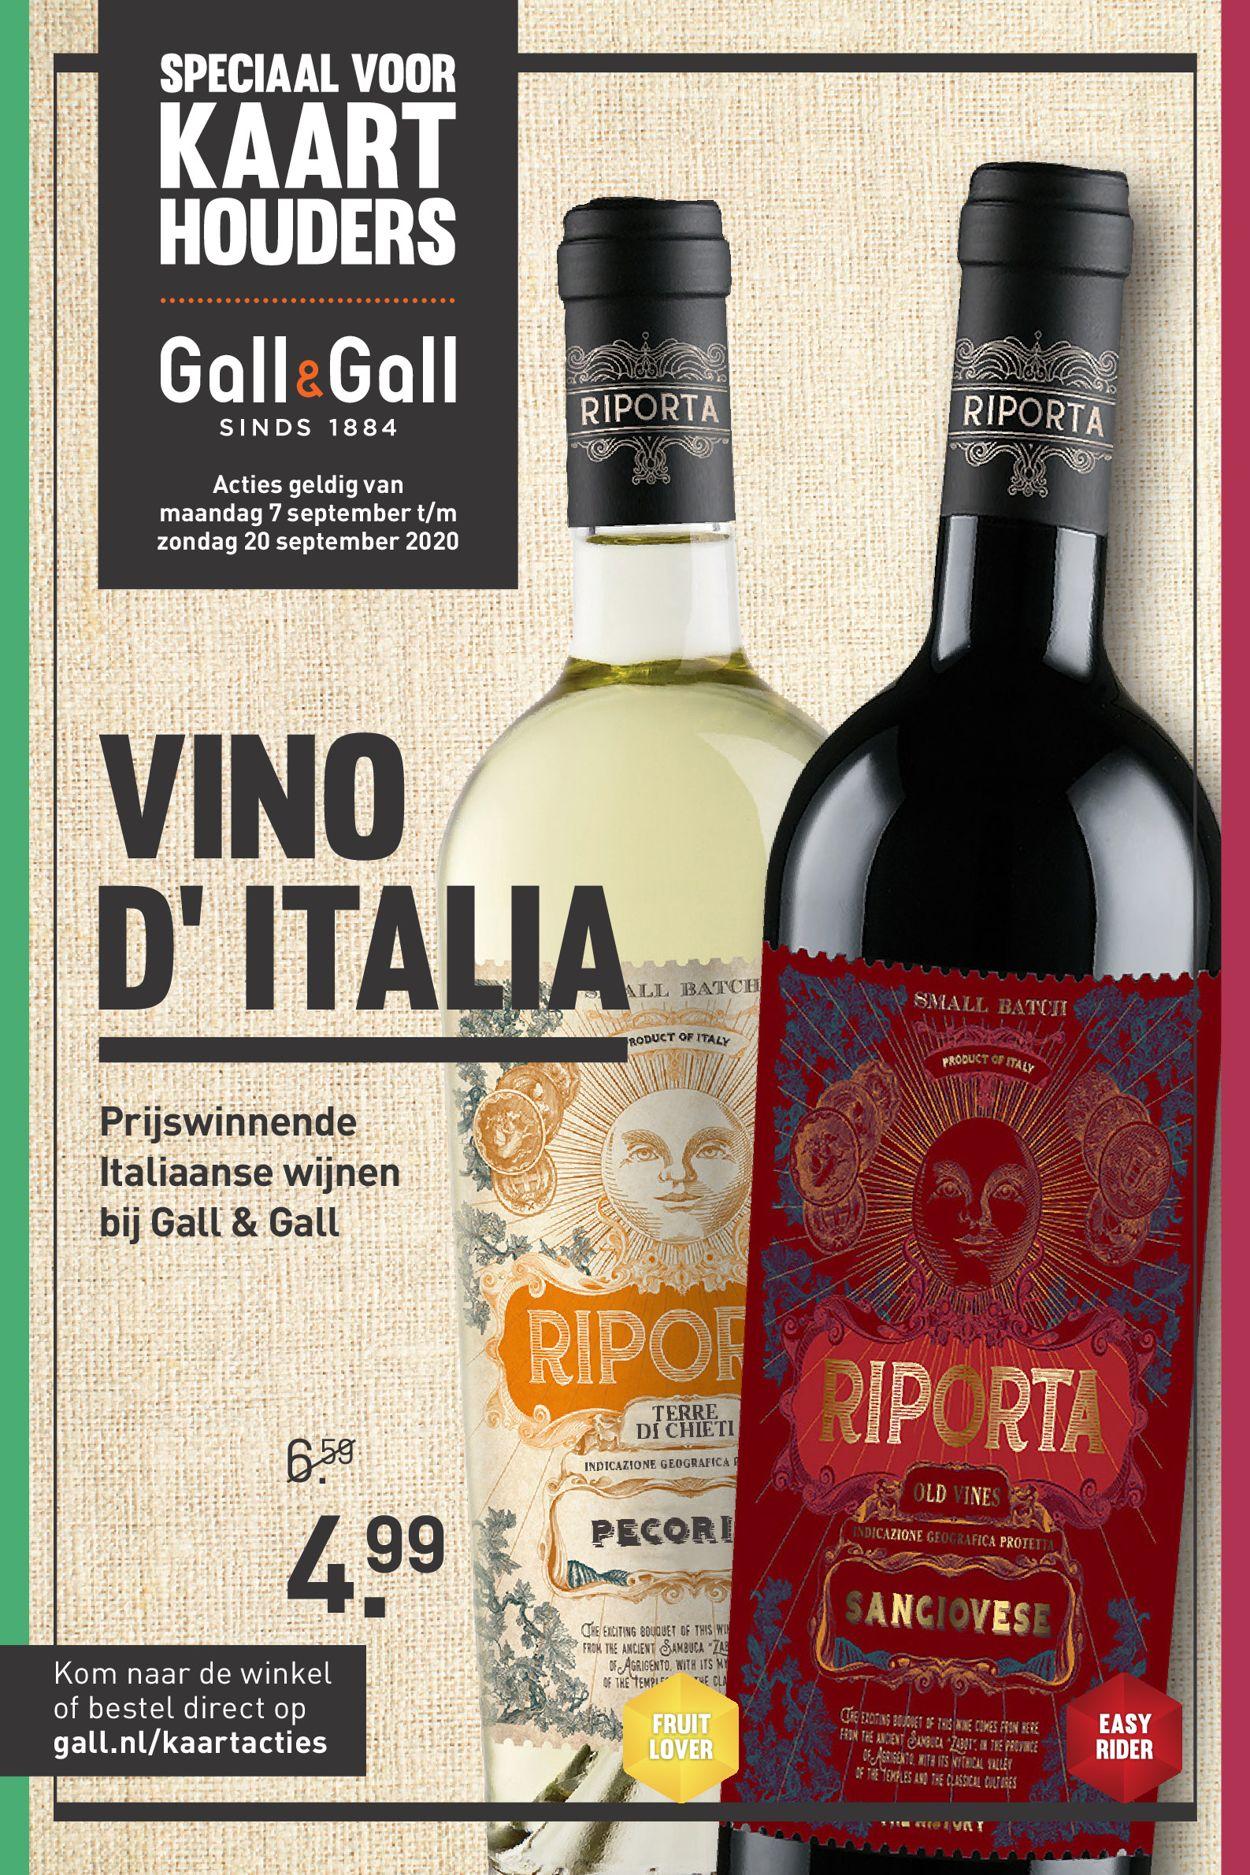 Catalogus van Gall & Gall van 07.09.2020